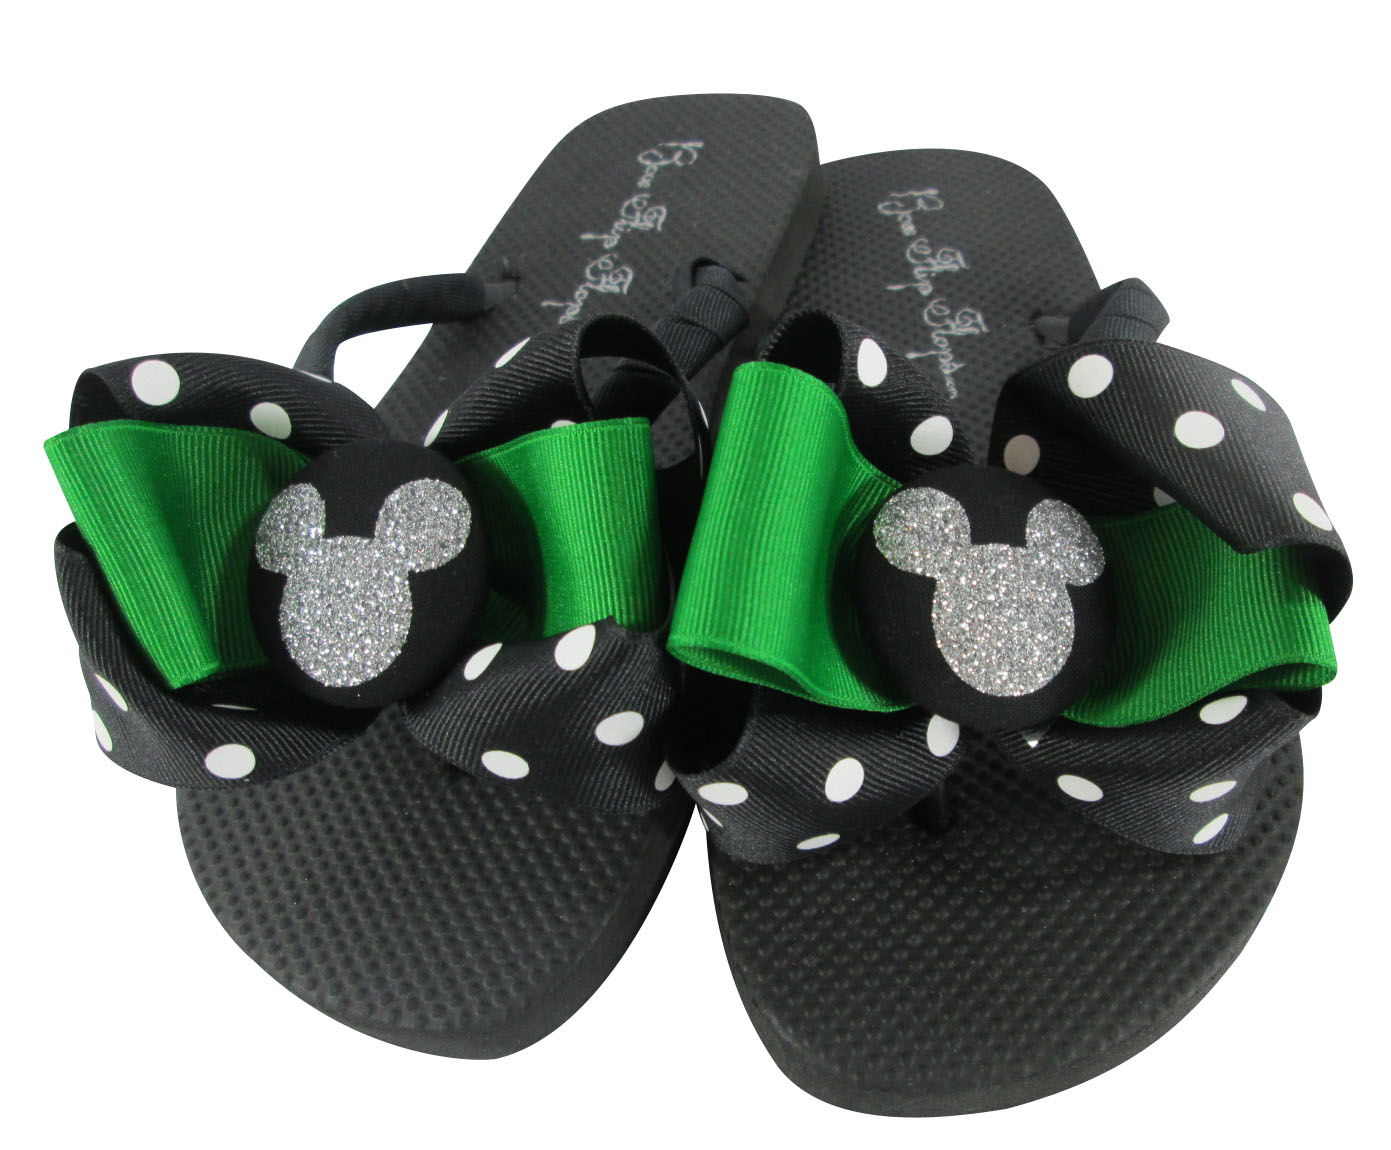 bd7fb5b1c5a91c Disney Flip Flops